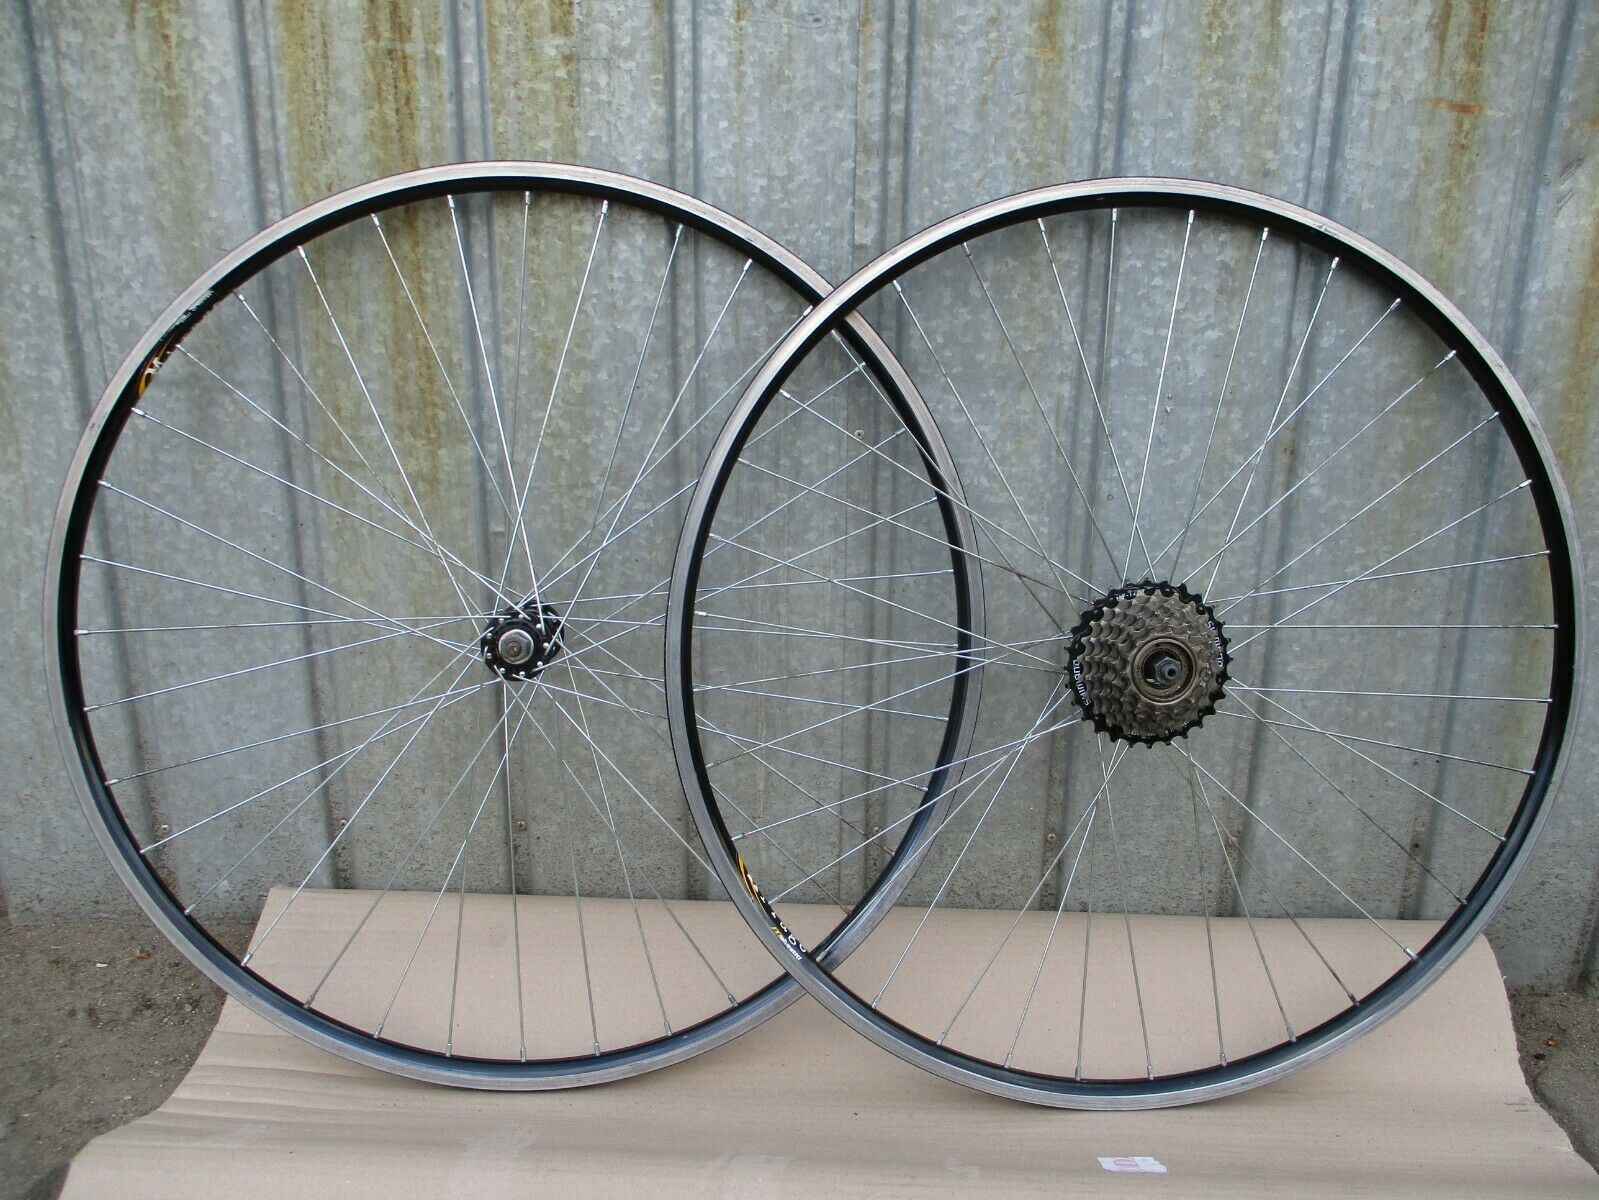 Vintage  wheelset Joytech   Mirage - 36 holes - 7 speed  lowest prices